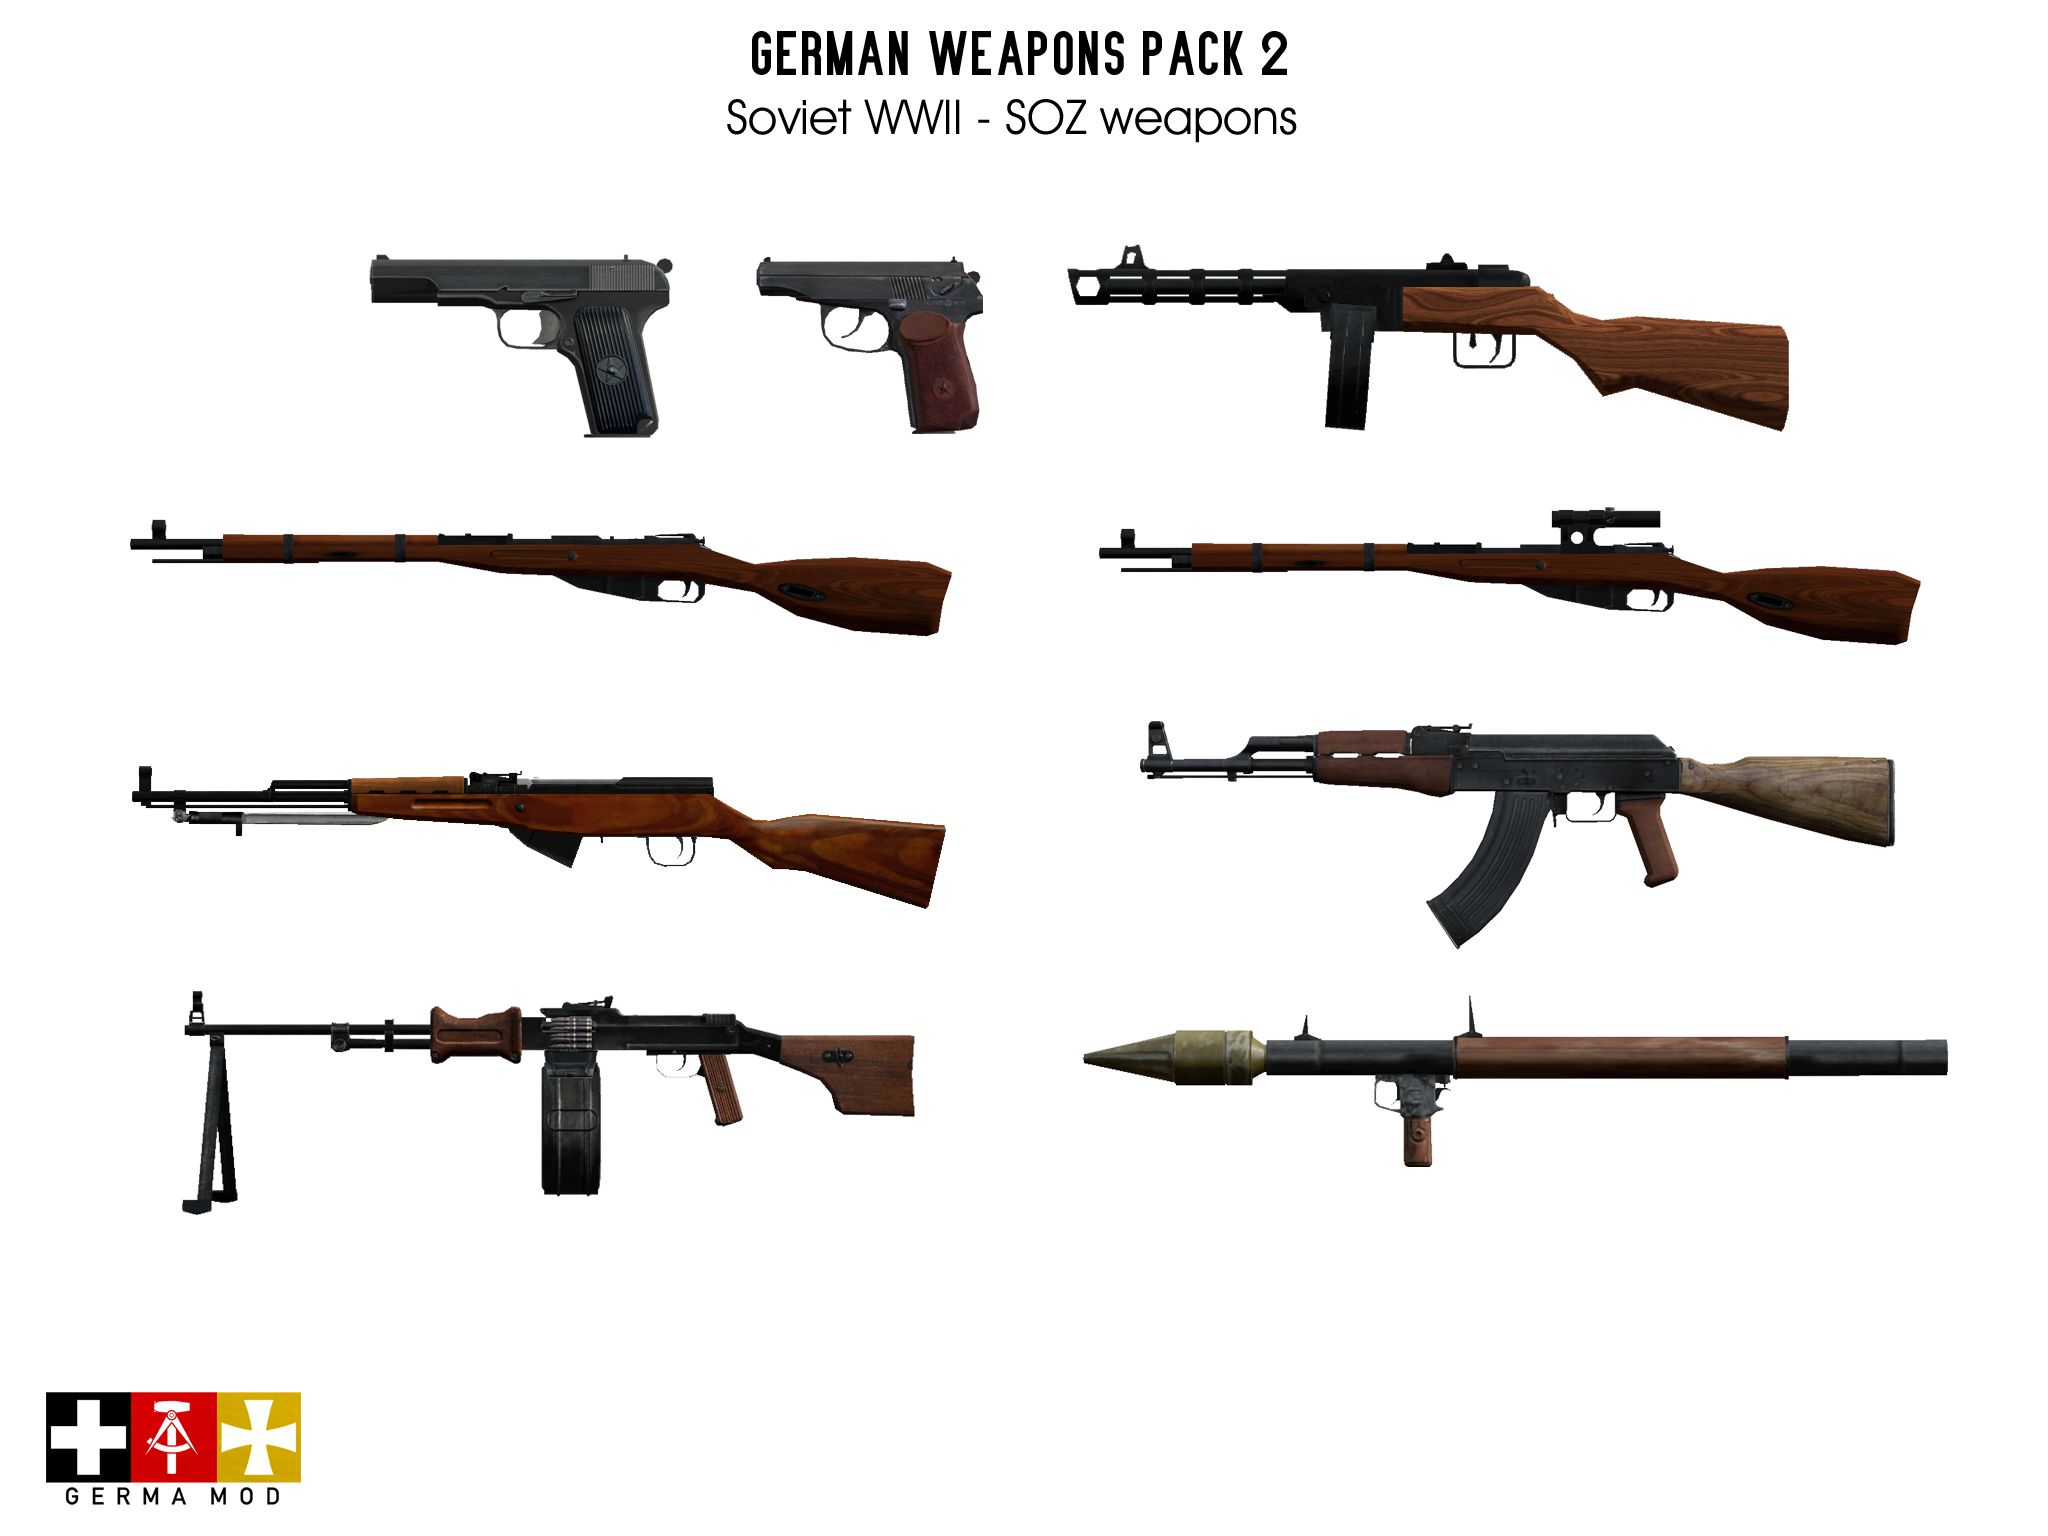 ww2 german posters - Recherche Google   Armes   Pinterest ...